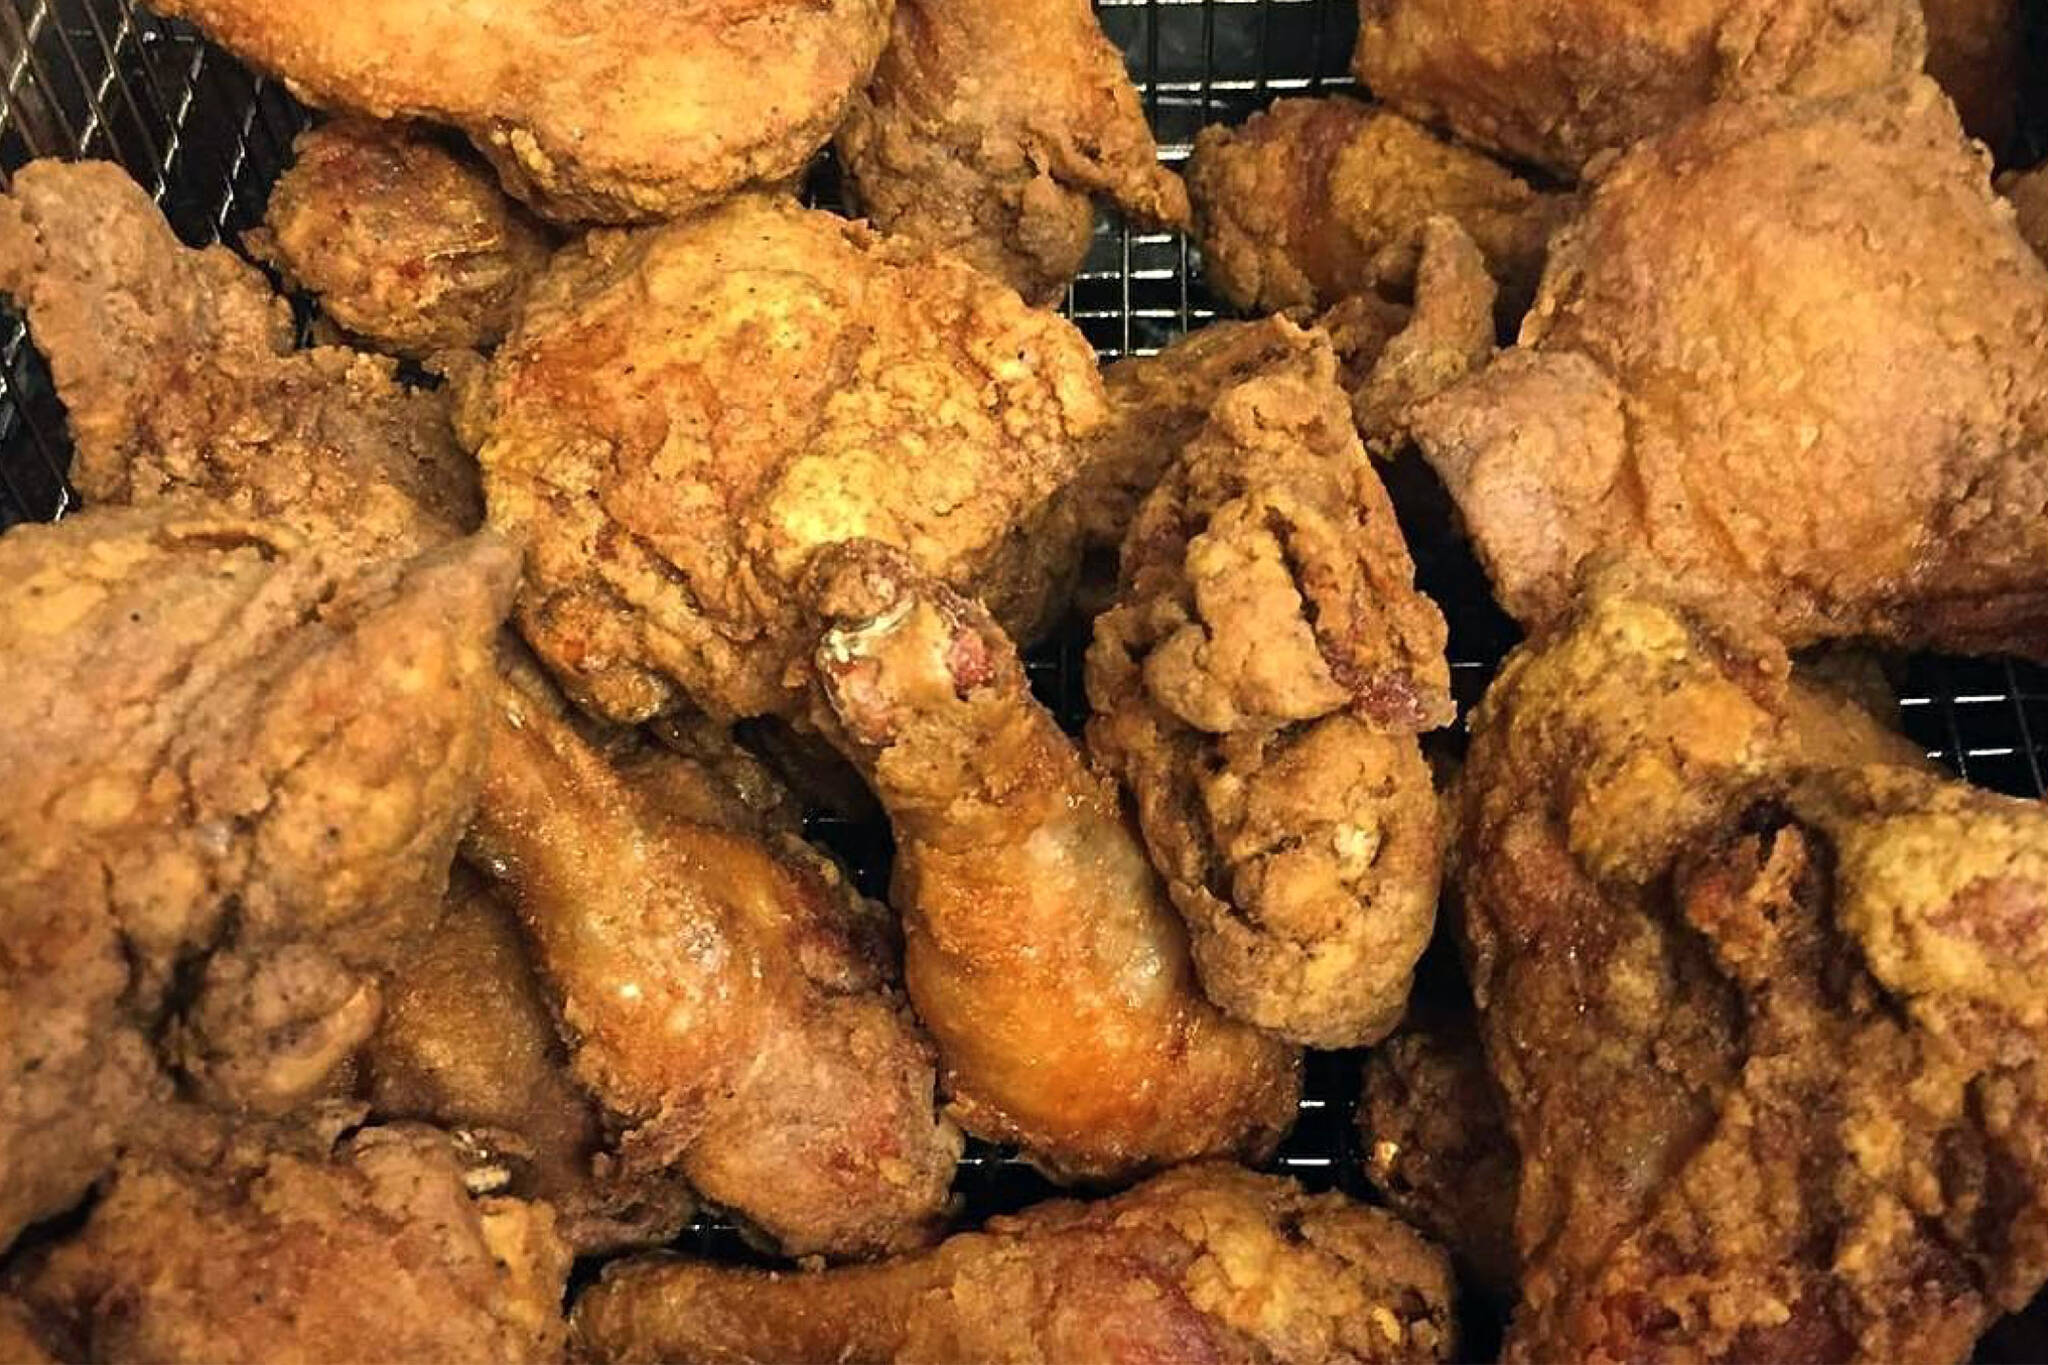 AYCE fried chicken toronto